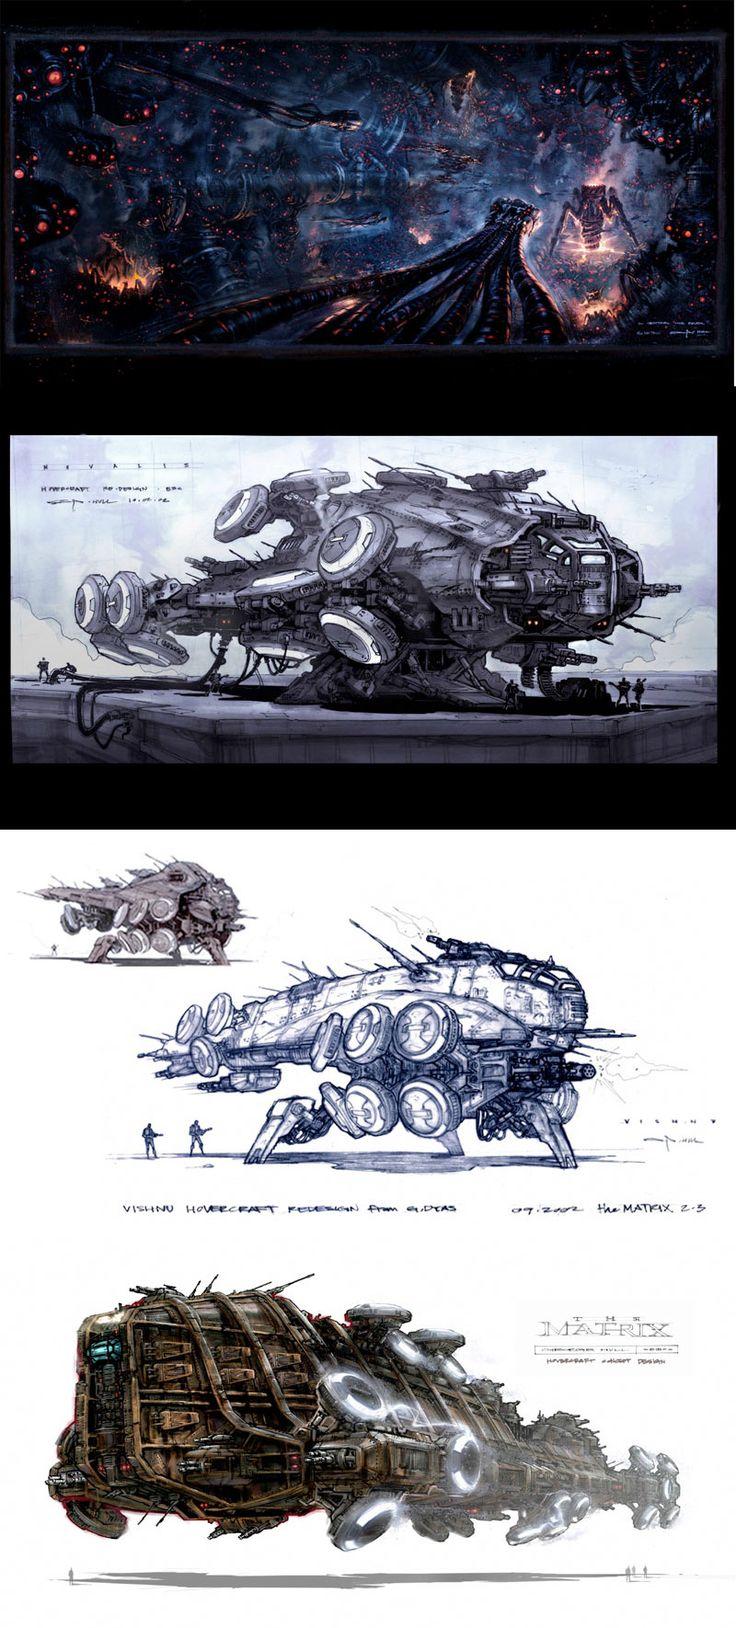 Concept Arts dos filmes Matrix Revolutions e Reloaded | THECAB - The Concept Art Blog